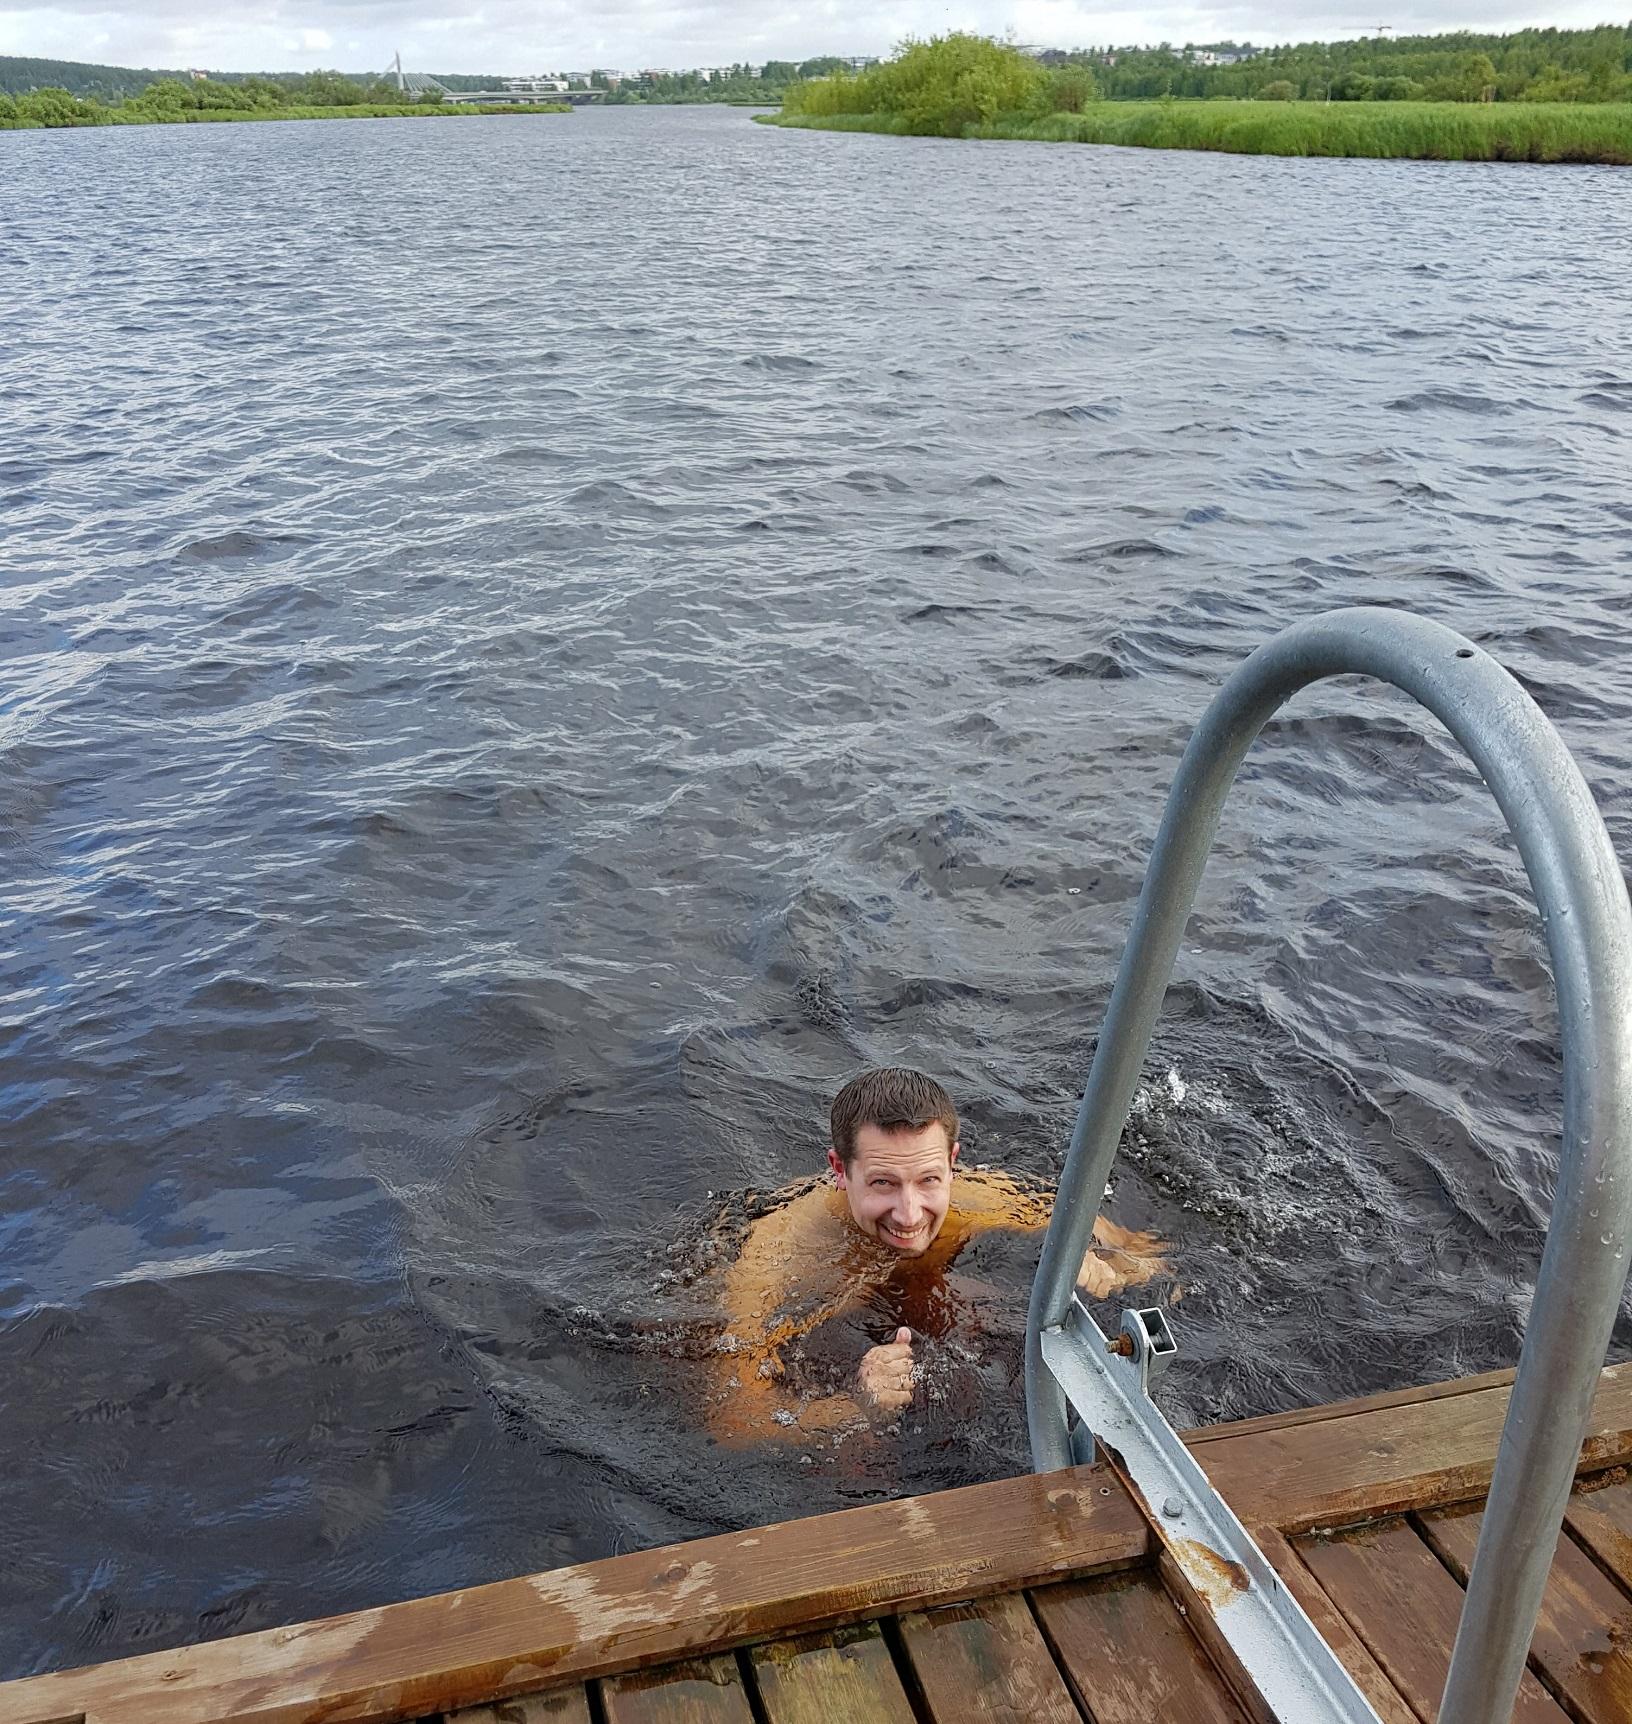 Bad im Fluss Ounasjoki bei Rovaniemi